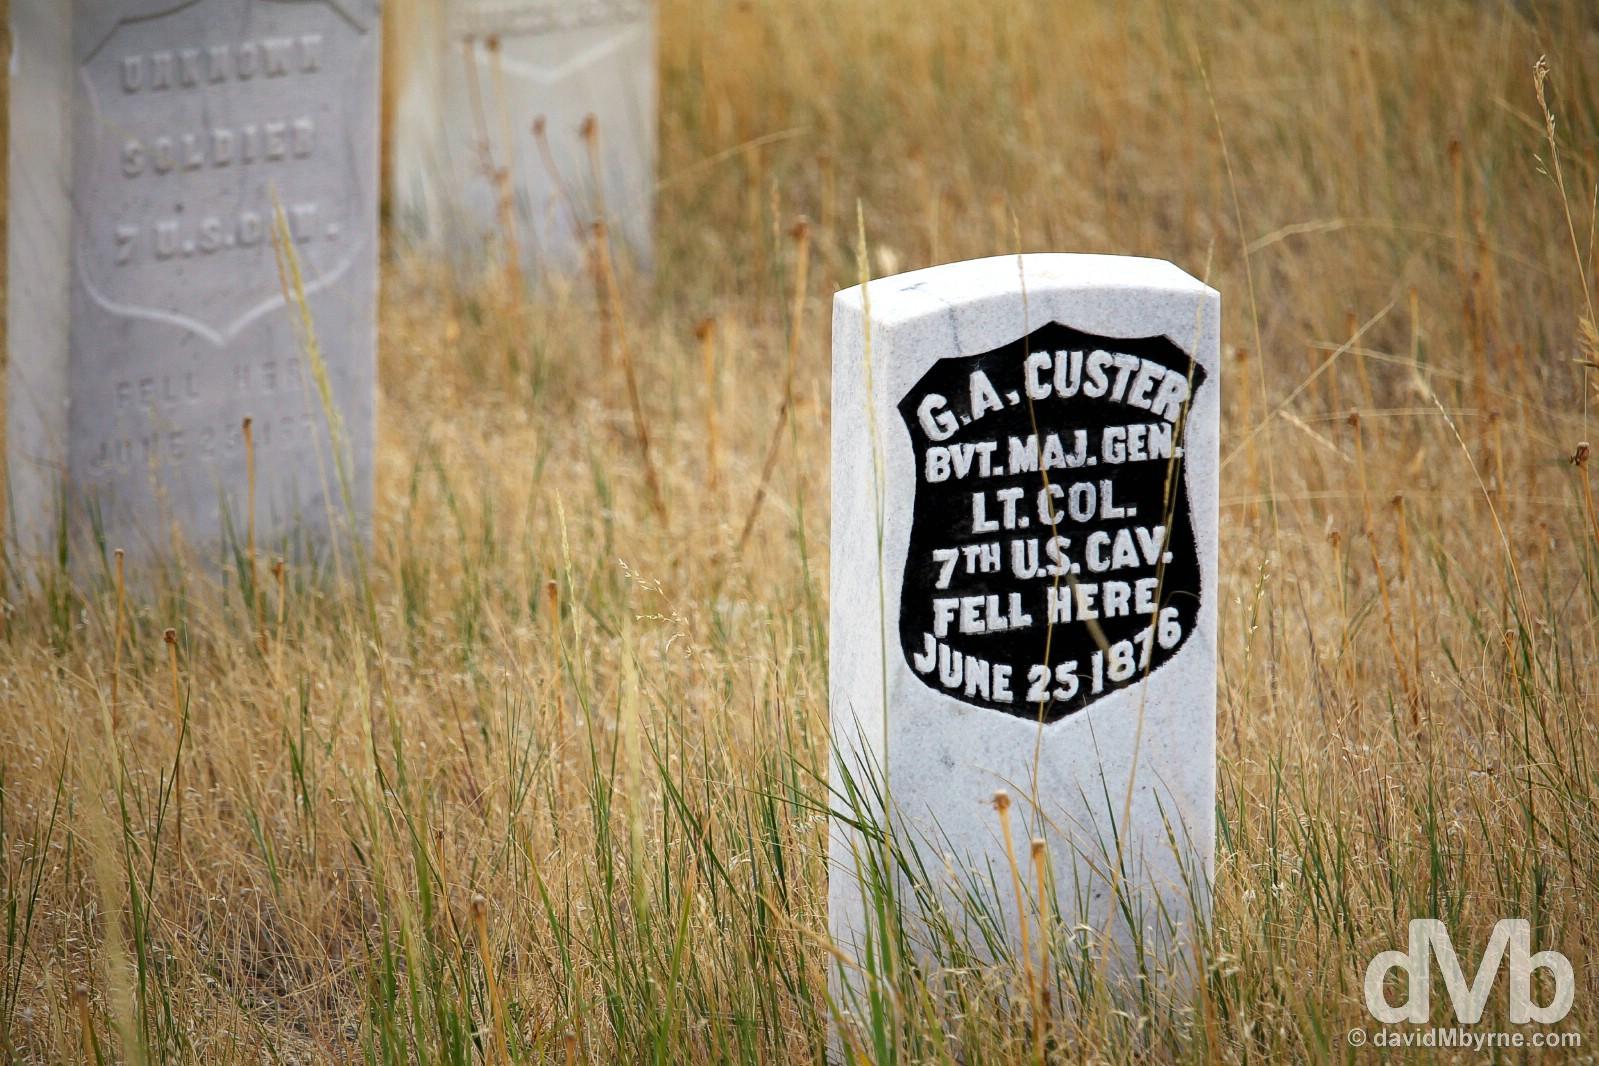 Custer marker stone, Little Bighorn Battlefield National Monument, Montana, USA. September 3, 2016.